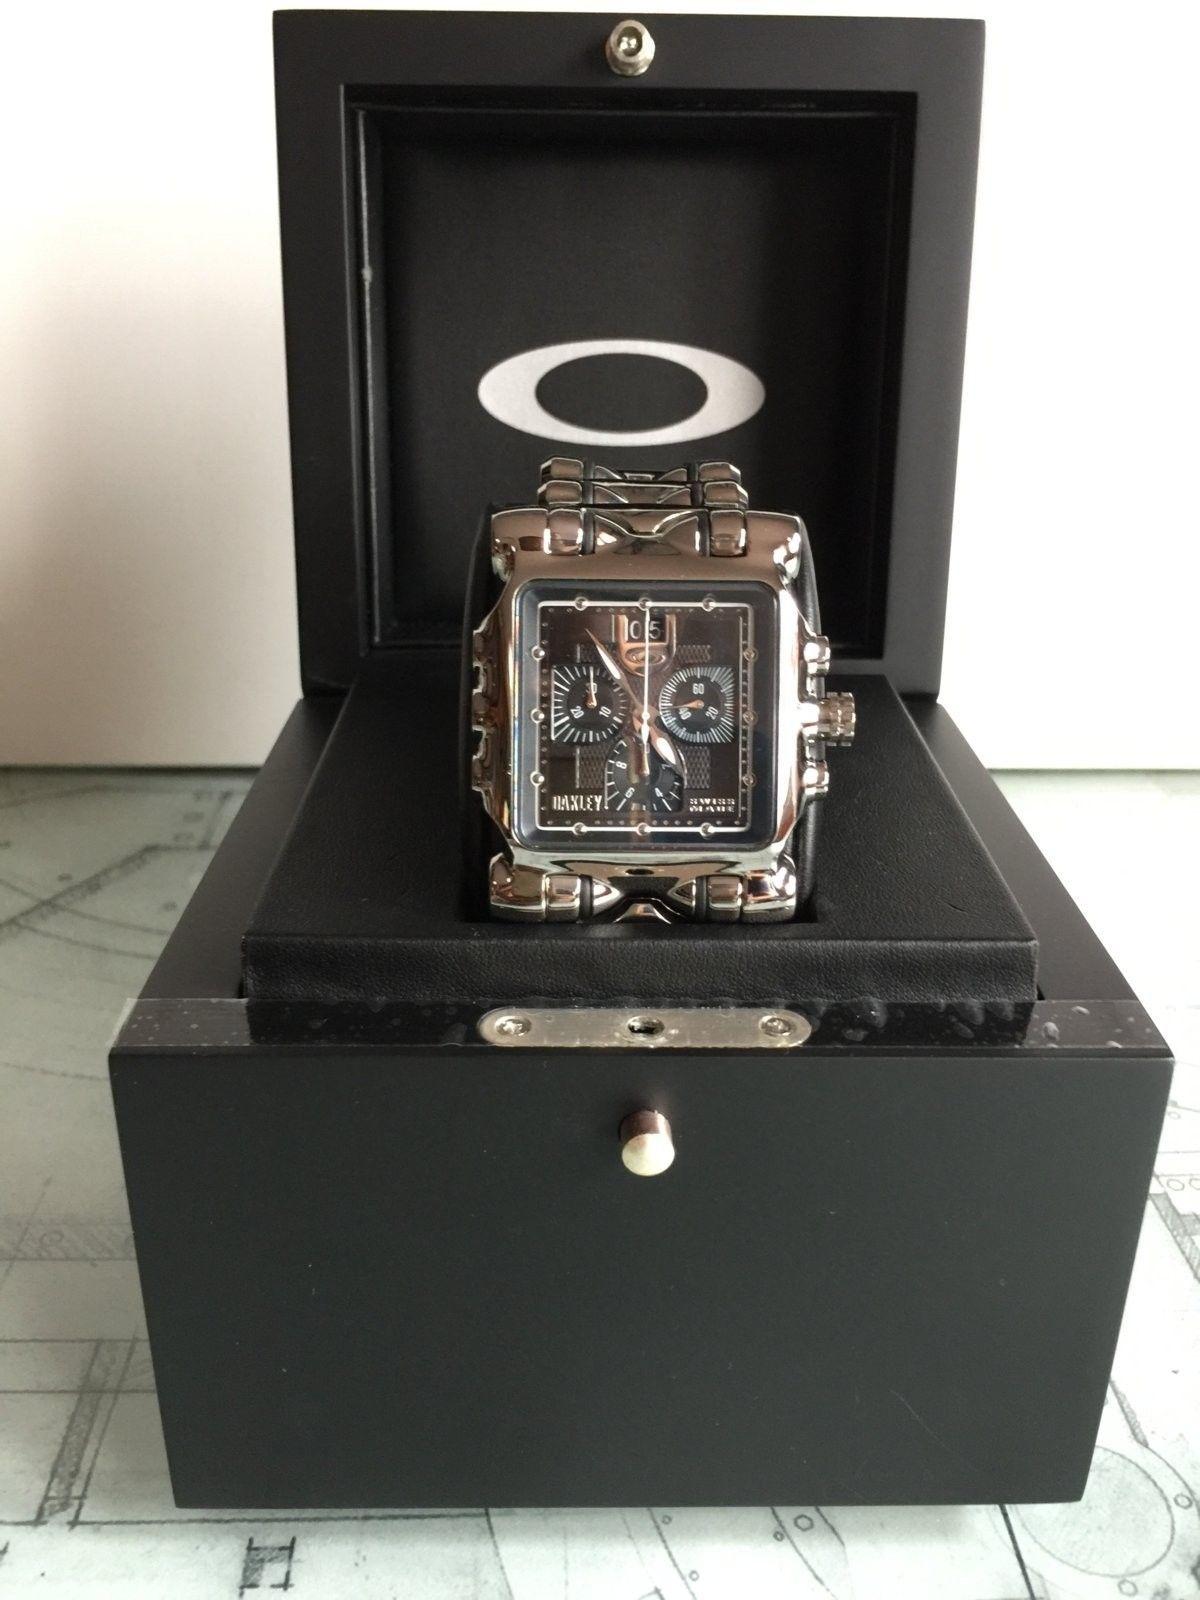 LNIB Polished Black Dial Minute Machine watch - IMG_6072.JPG